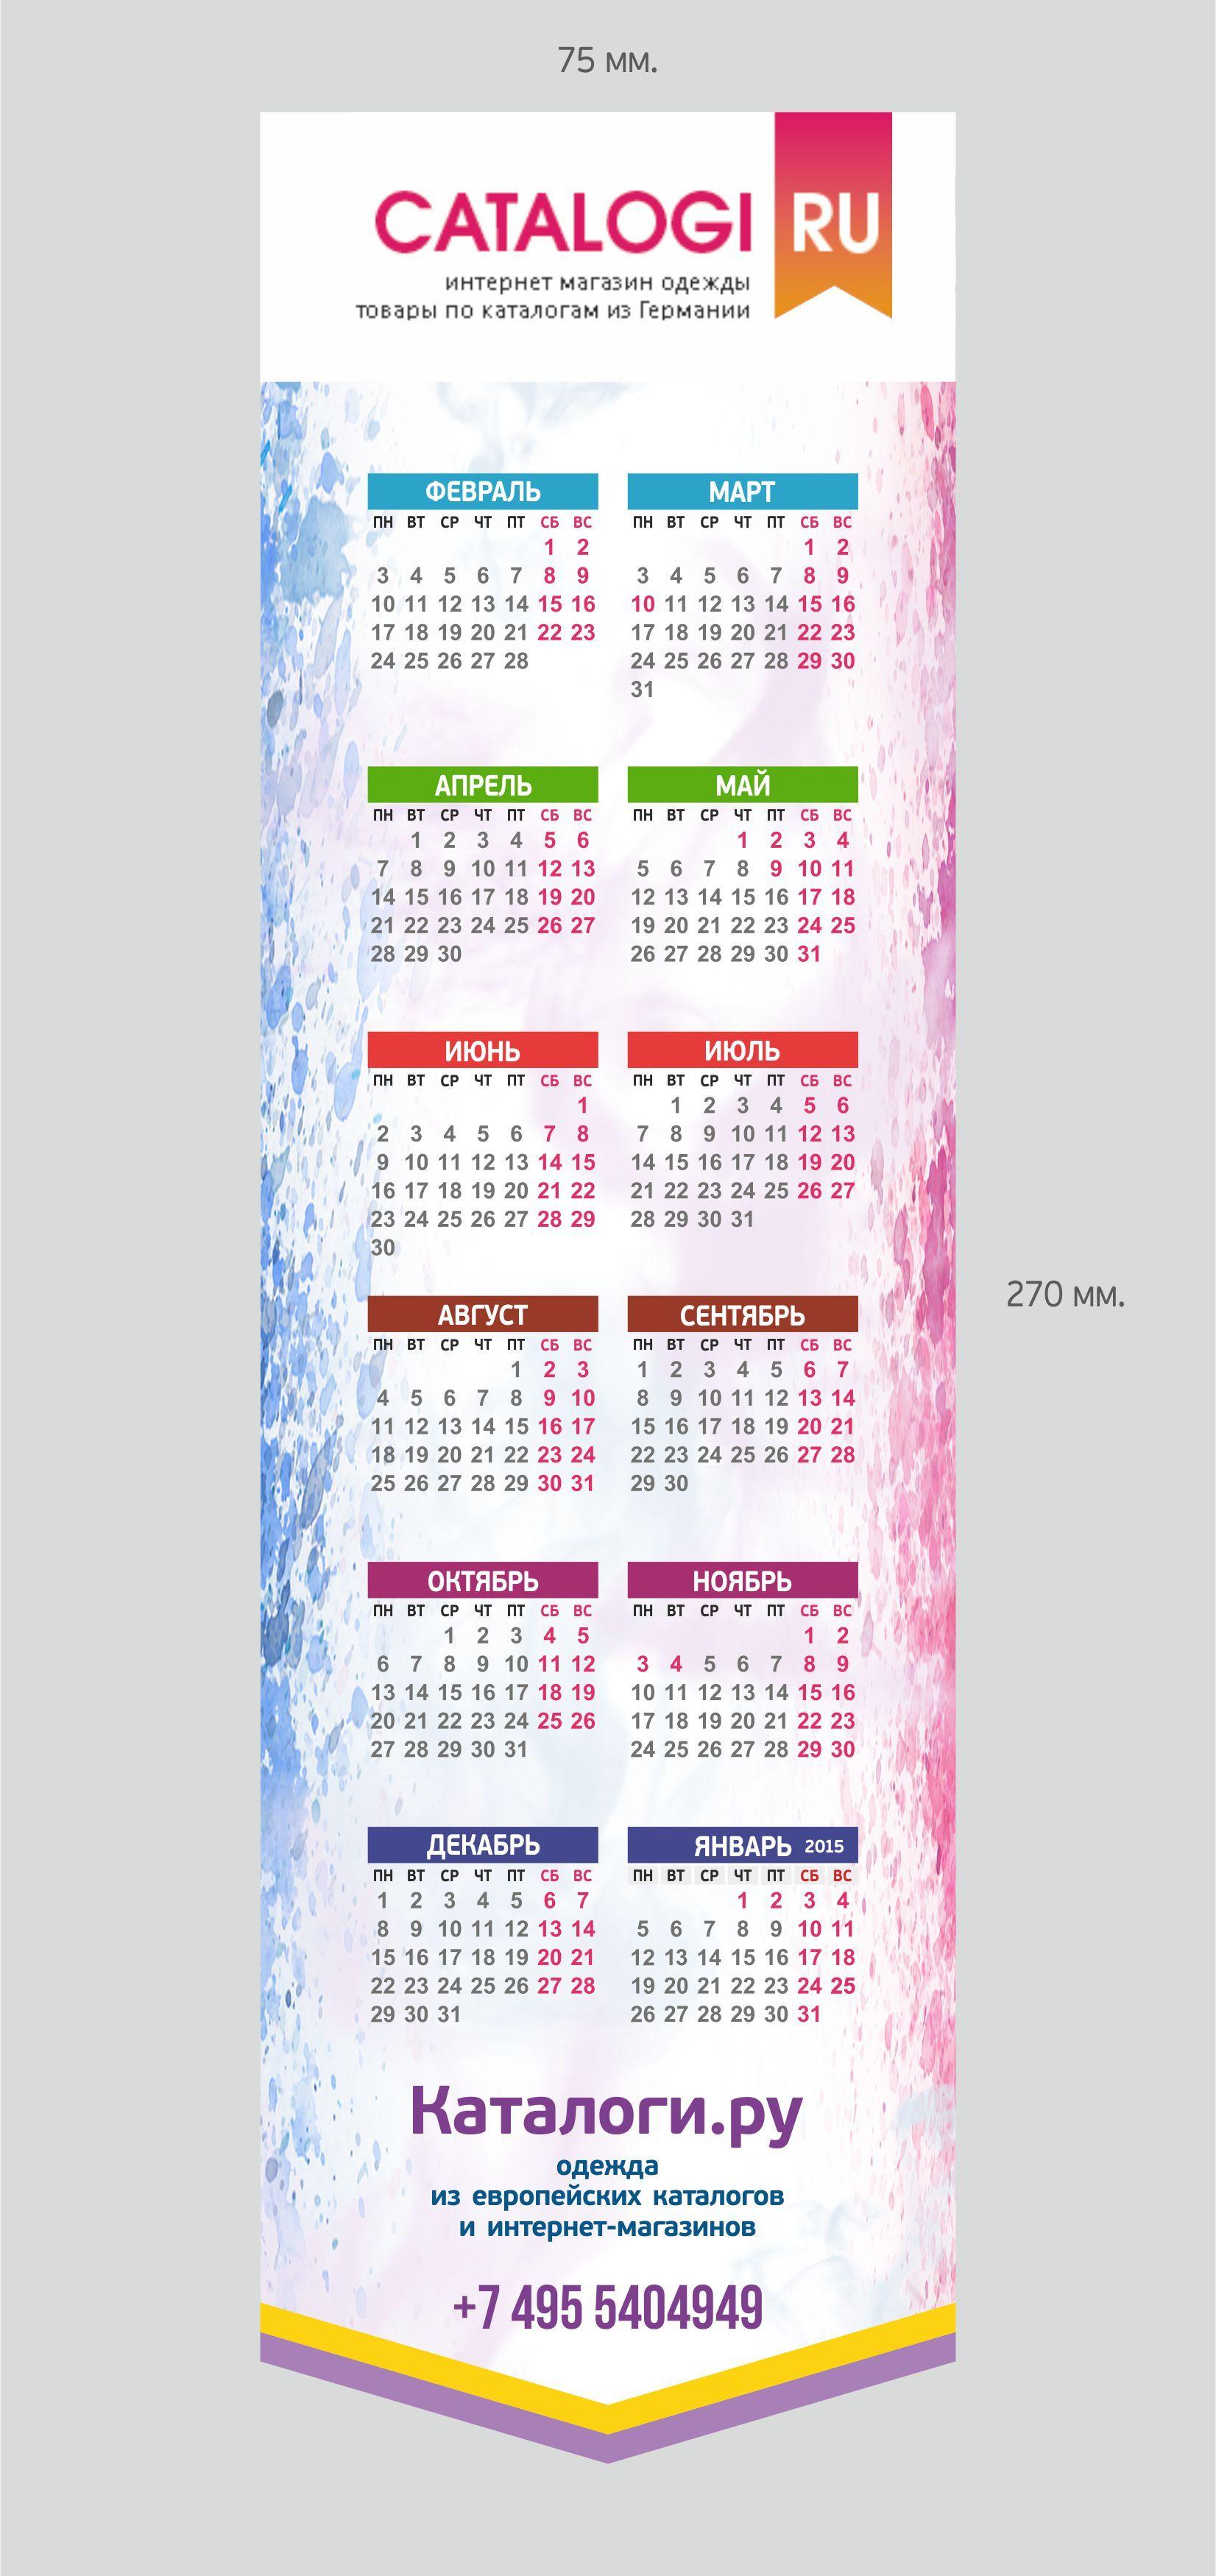 Календарик на монитор Catalogi.ru - дизайнер Rhythm